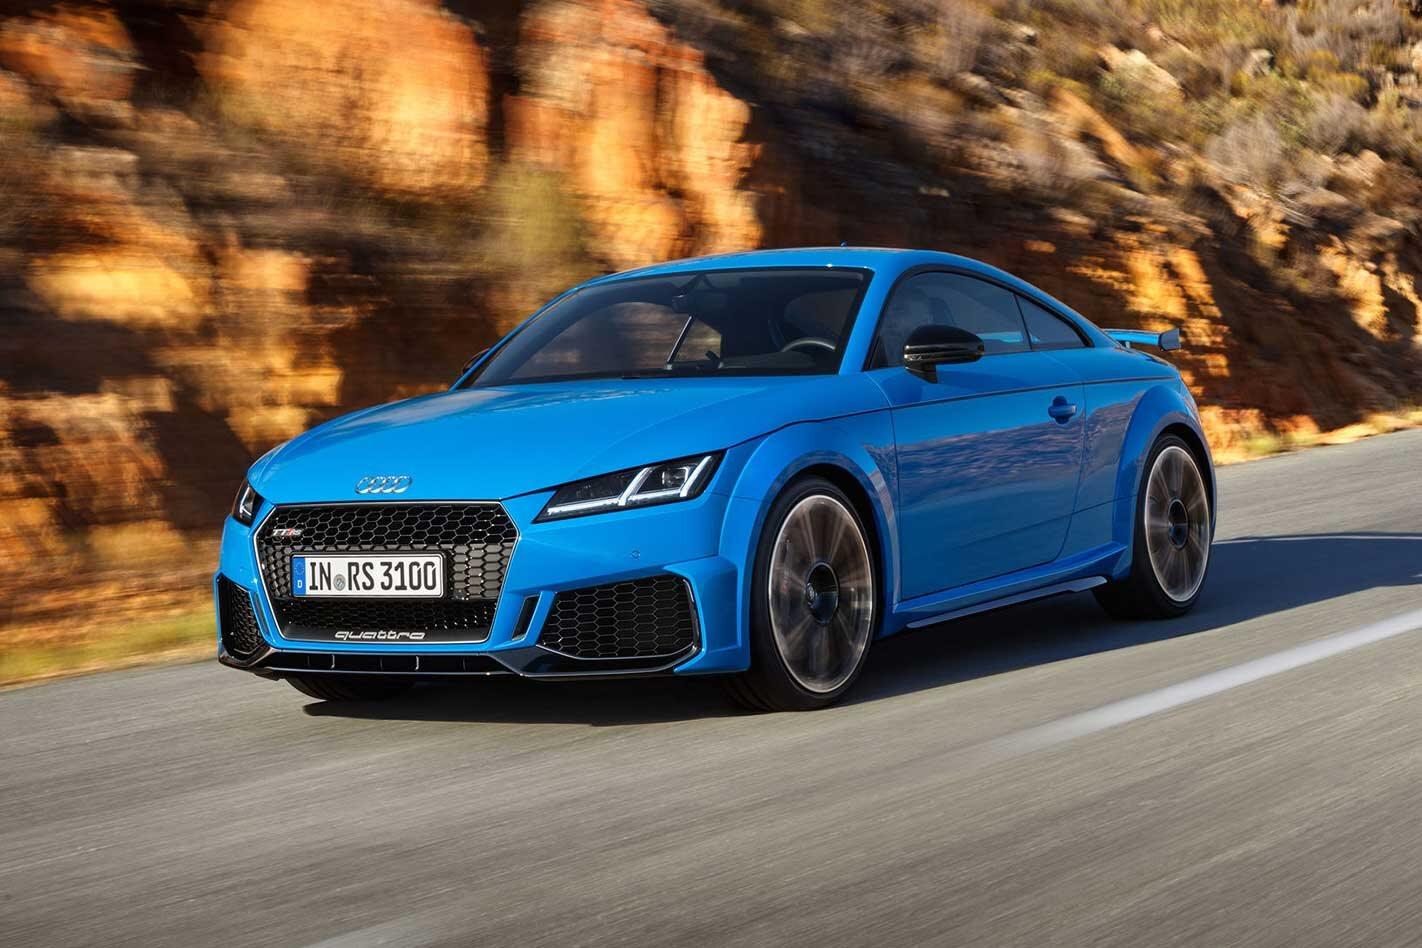 Audi TT RS facelifted for 2019